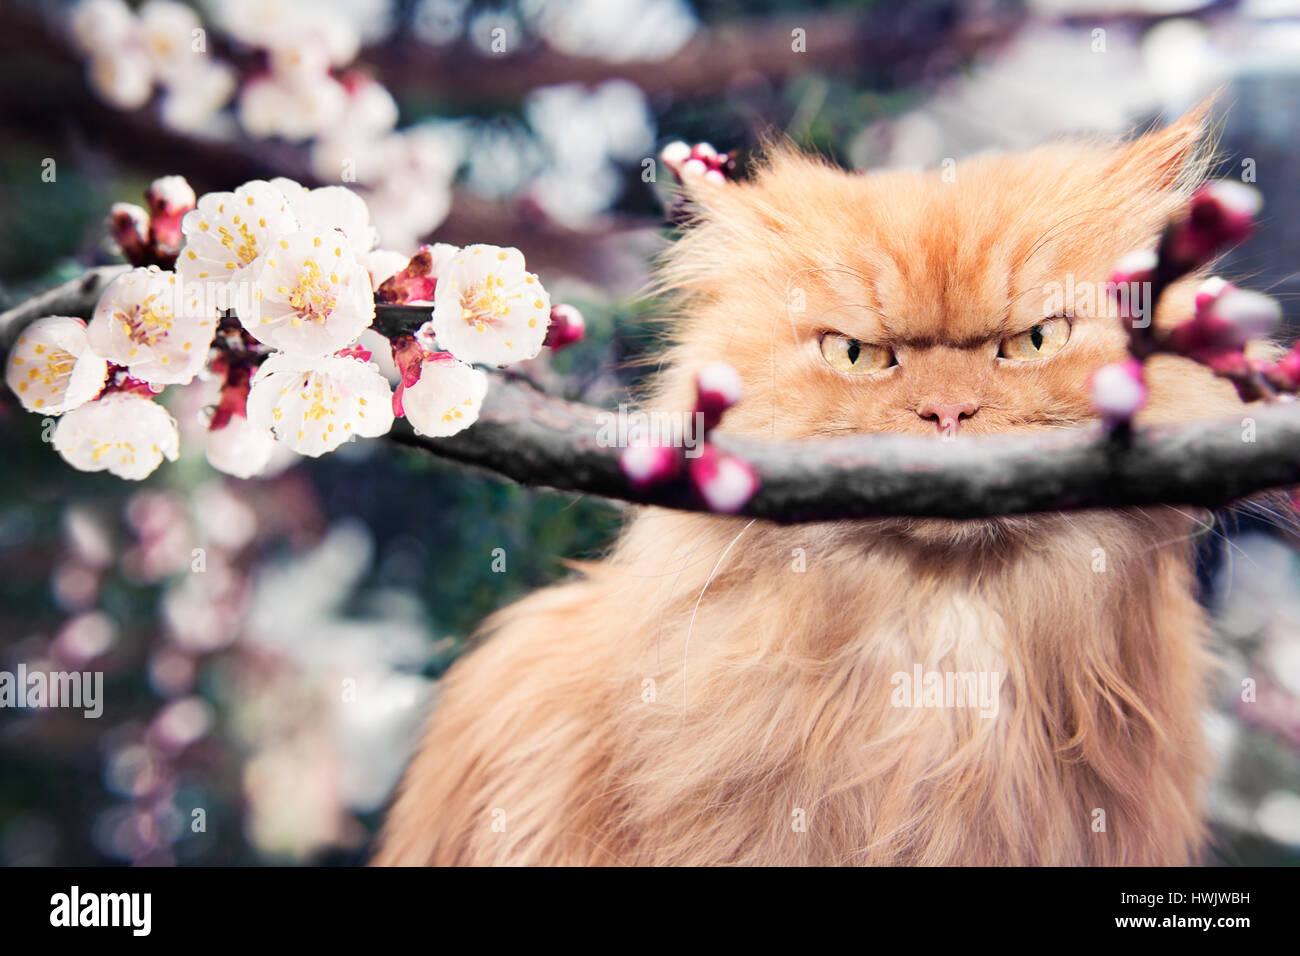 Perserkatze mit Frühlings-Blüte Stockbild